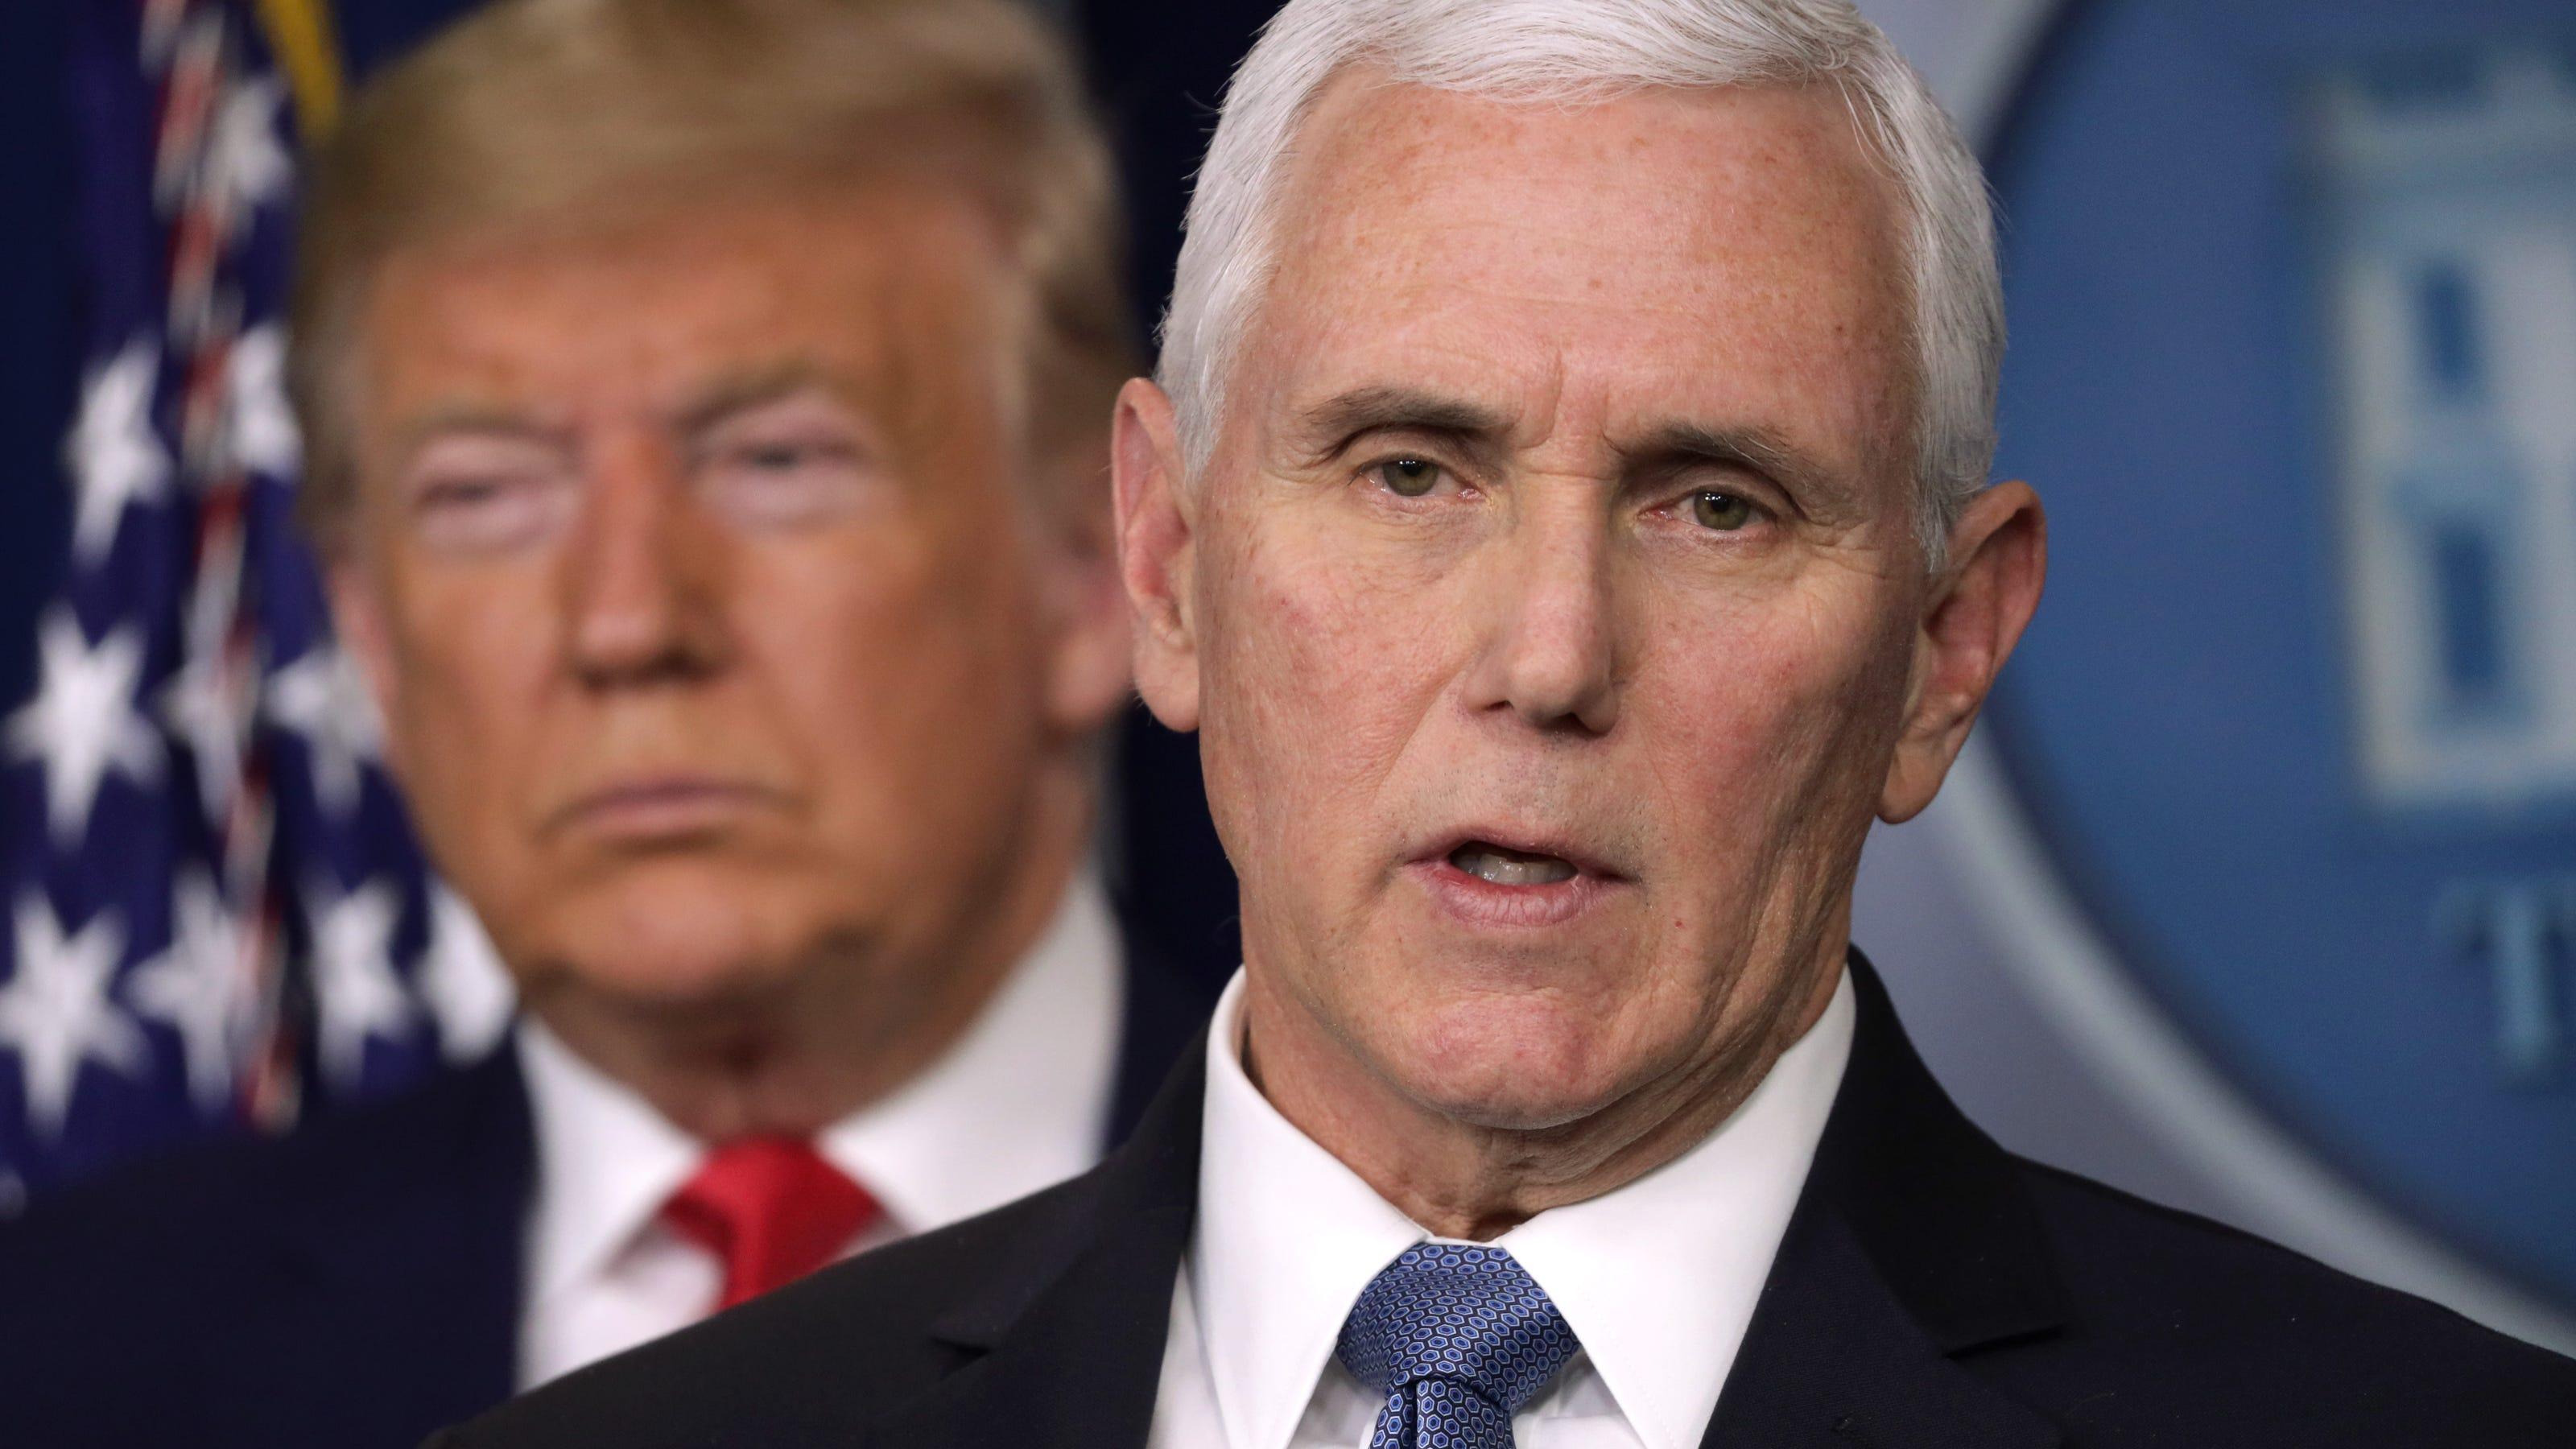 Mike Pence defends Trump Jr., Rush Limbaugh coronavirus comments